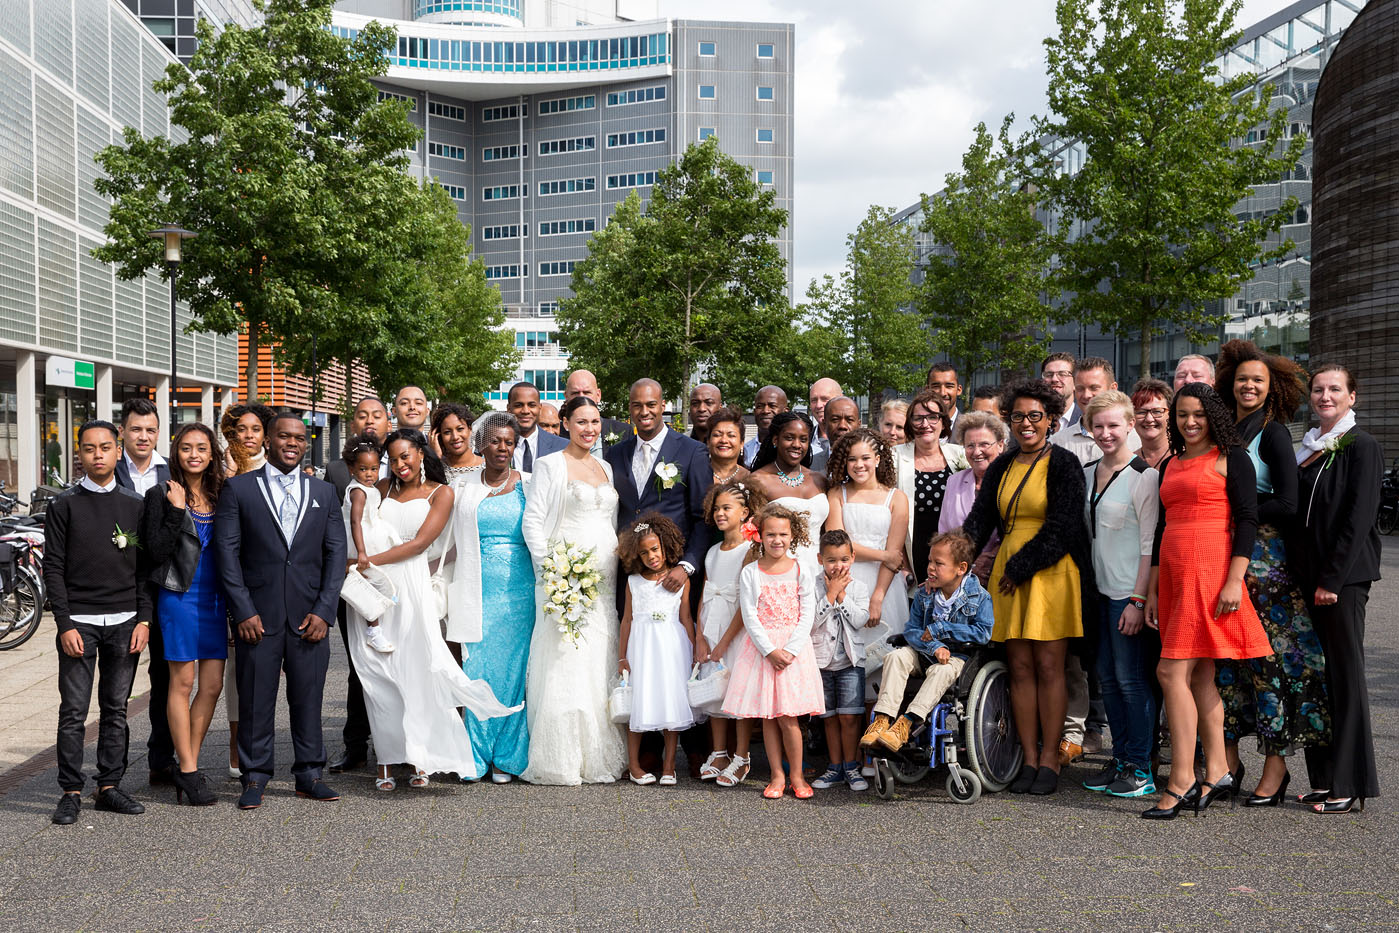 bruiloft-wedding-trouwen-rotterdam-fotograaf-bobhersbach-groep